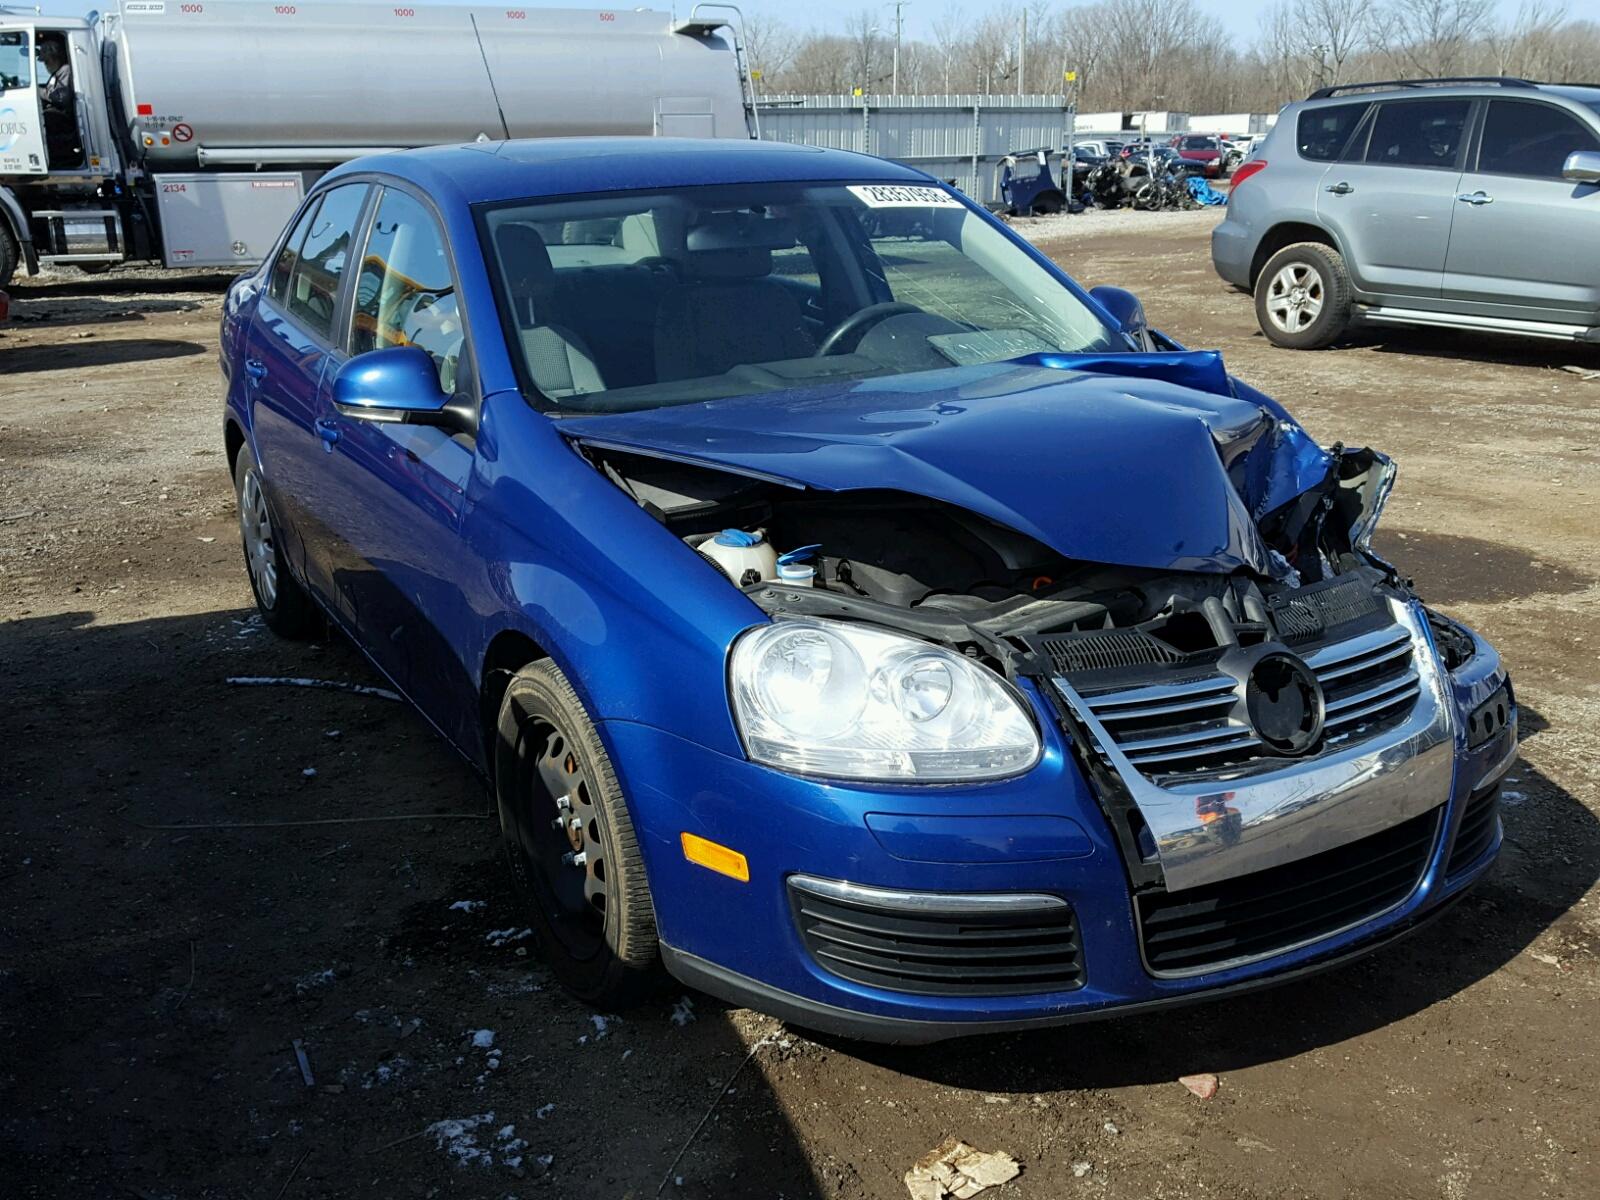 cert sale auctions salvage se view of on title online copart auto carfinder jetta black left ky in volkswagen lot louisville en